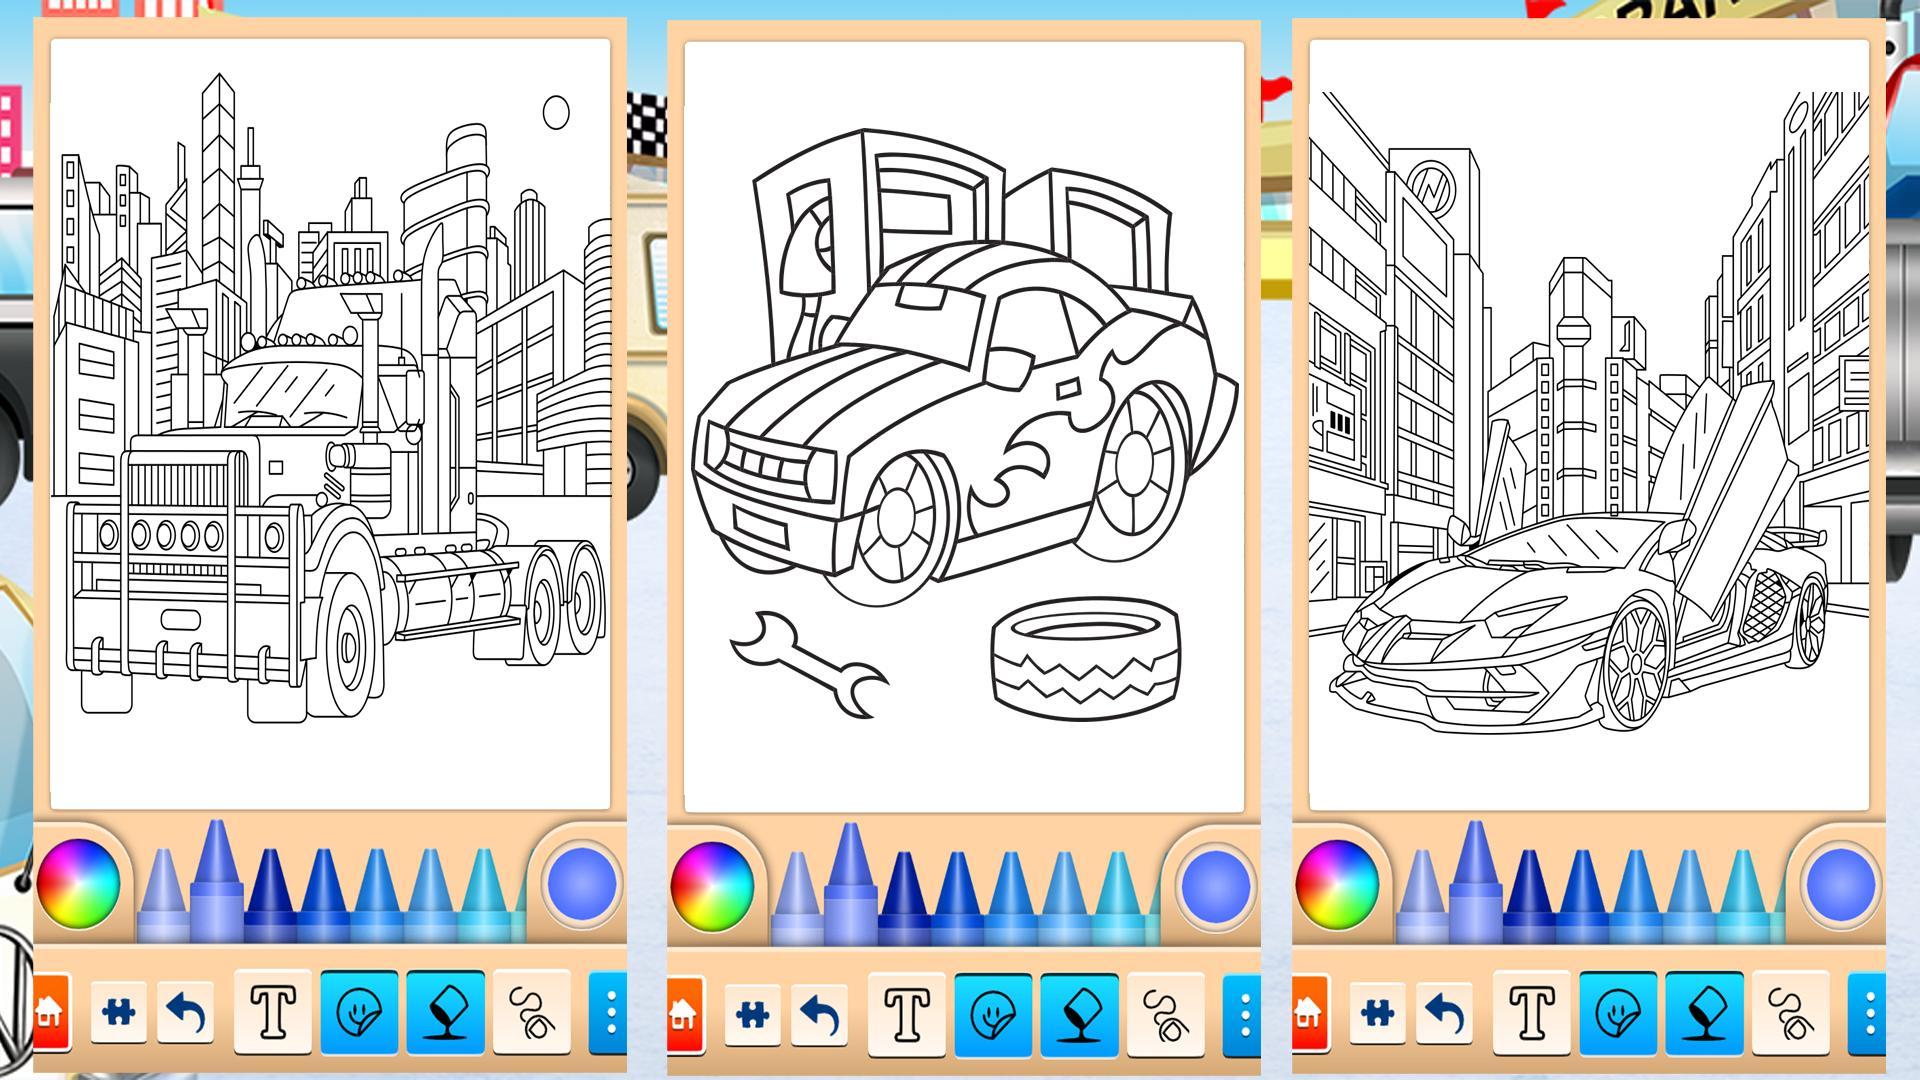 Arabalar 3 Boyama Sayfalary Boyama Sayfasi